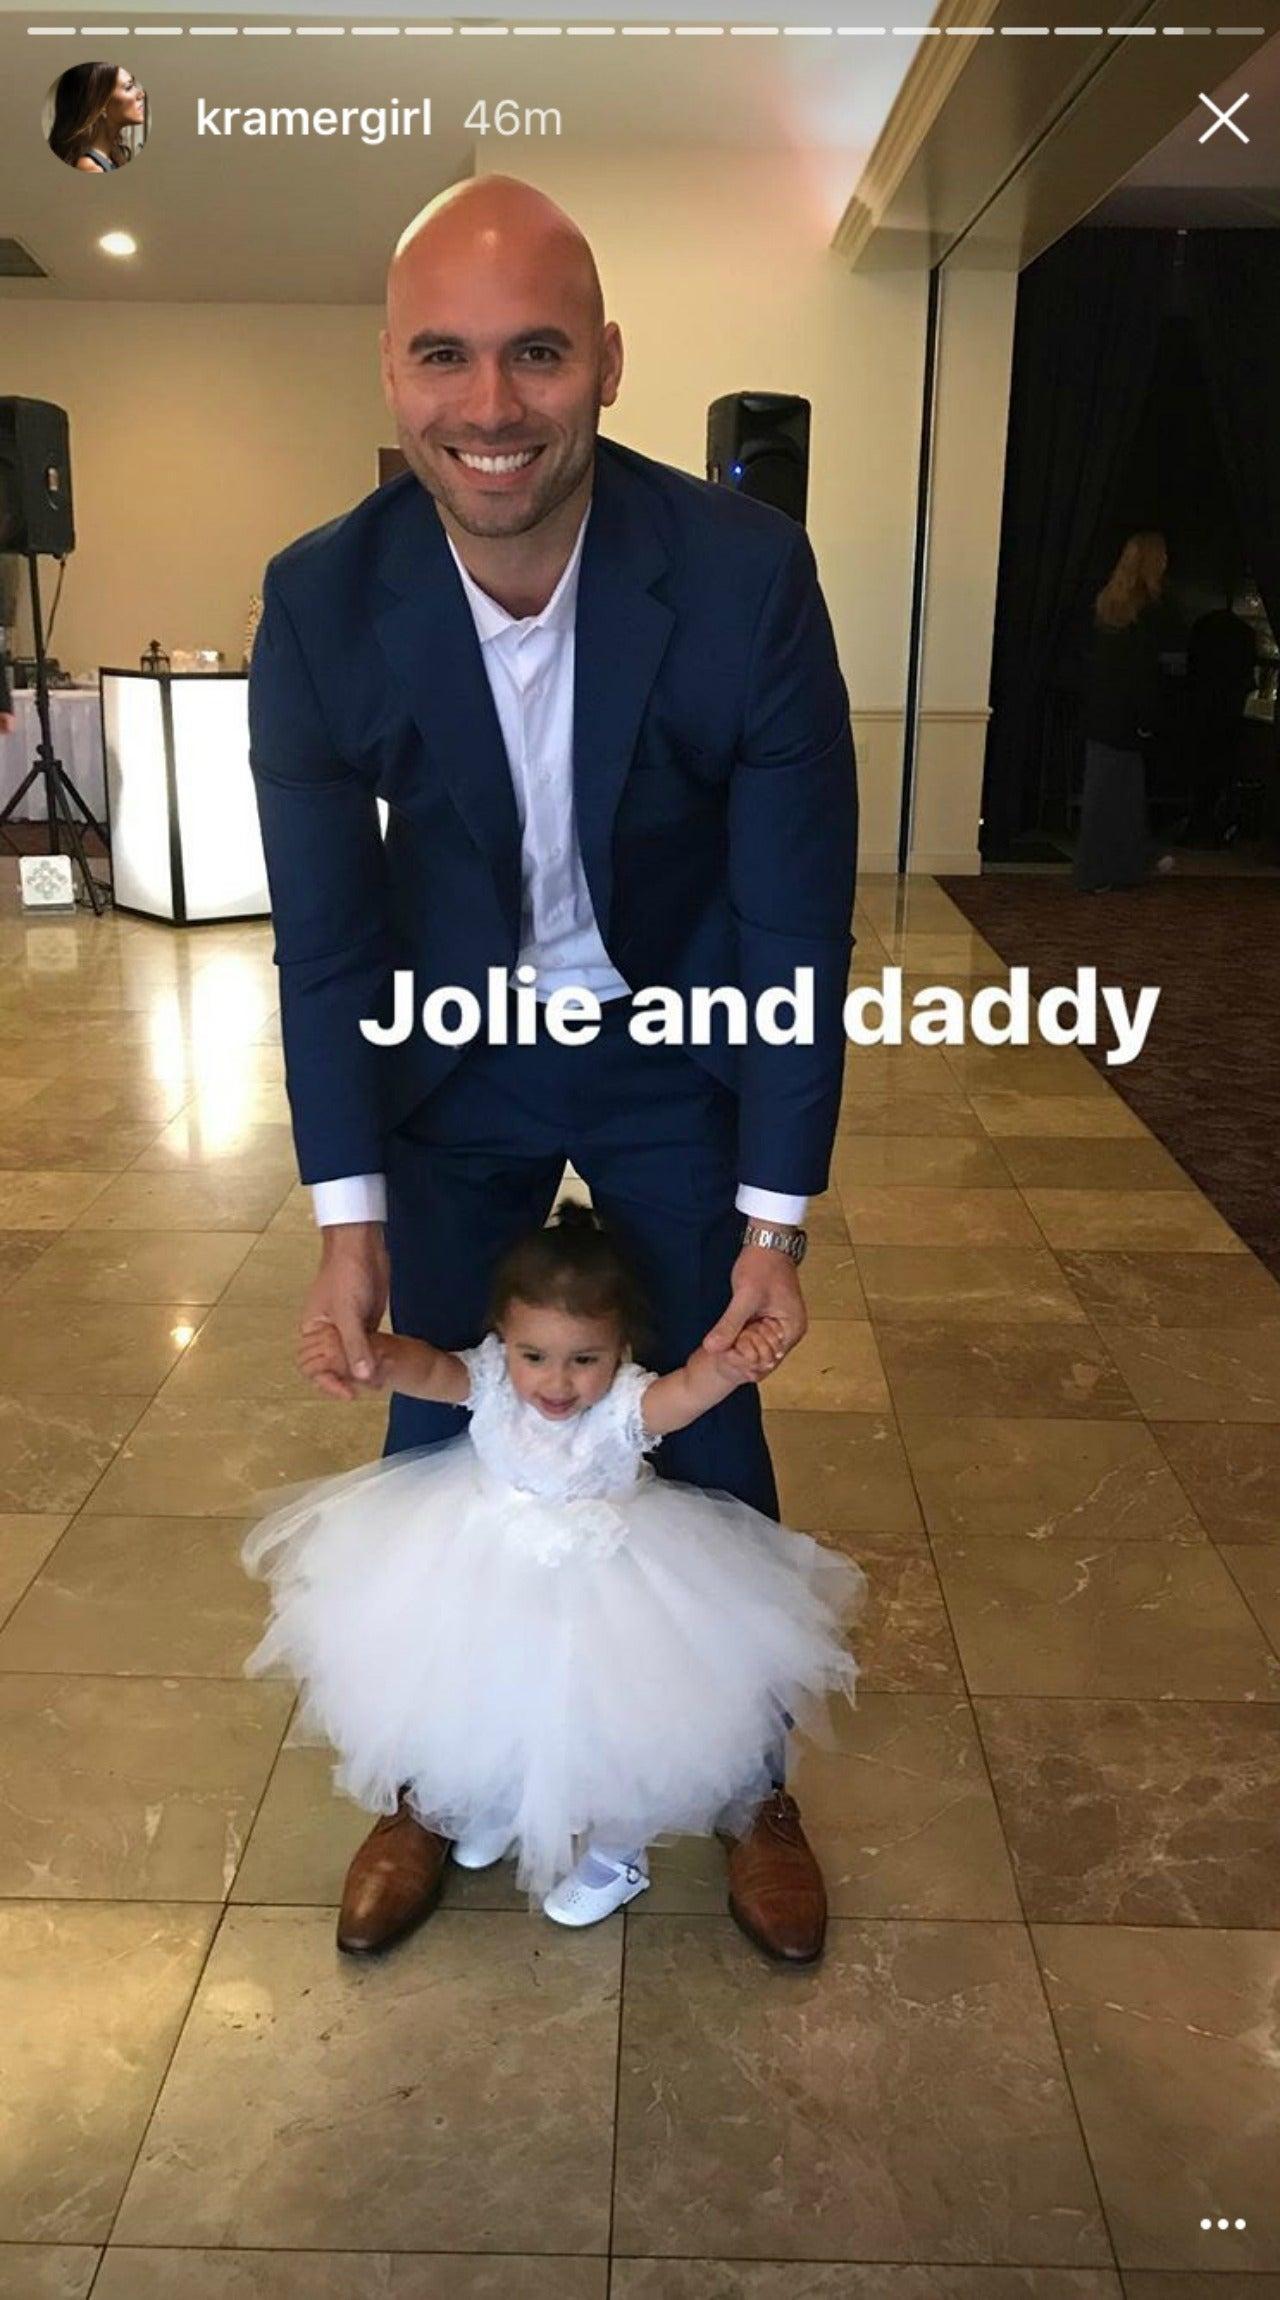 Jana kramer shares cute pic of daughter jolie at cousins wedding exclusive country singer jana kramer splits from husband mike caussin junglespirit Choice Image